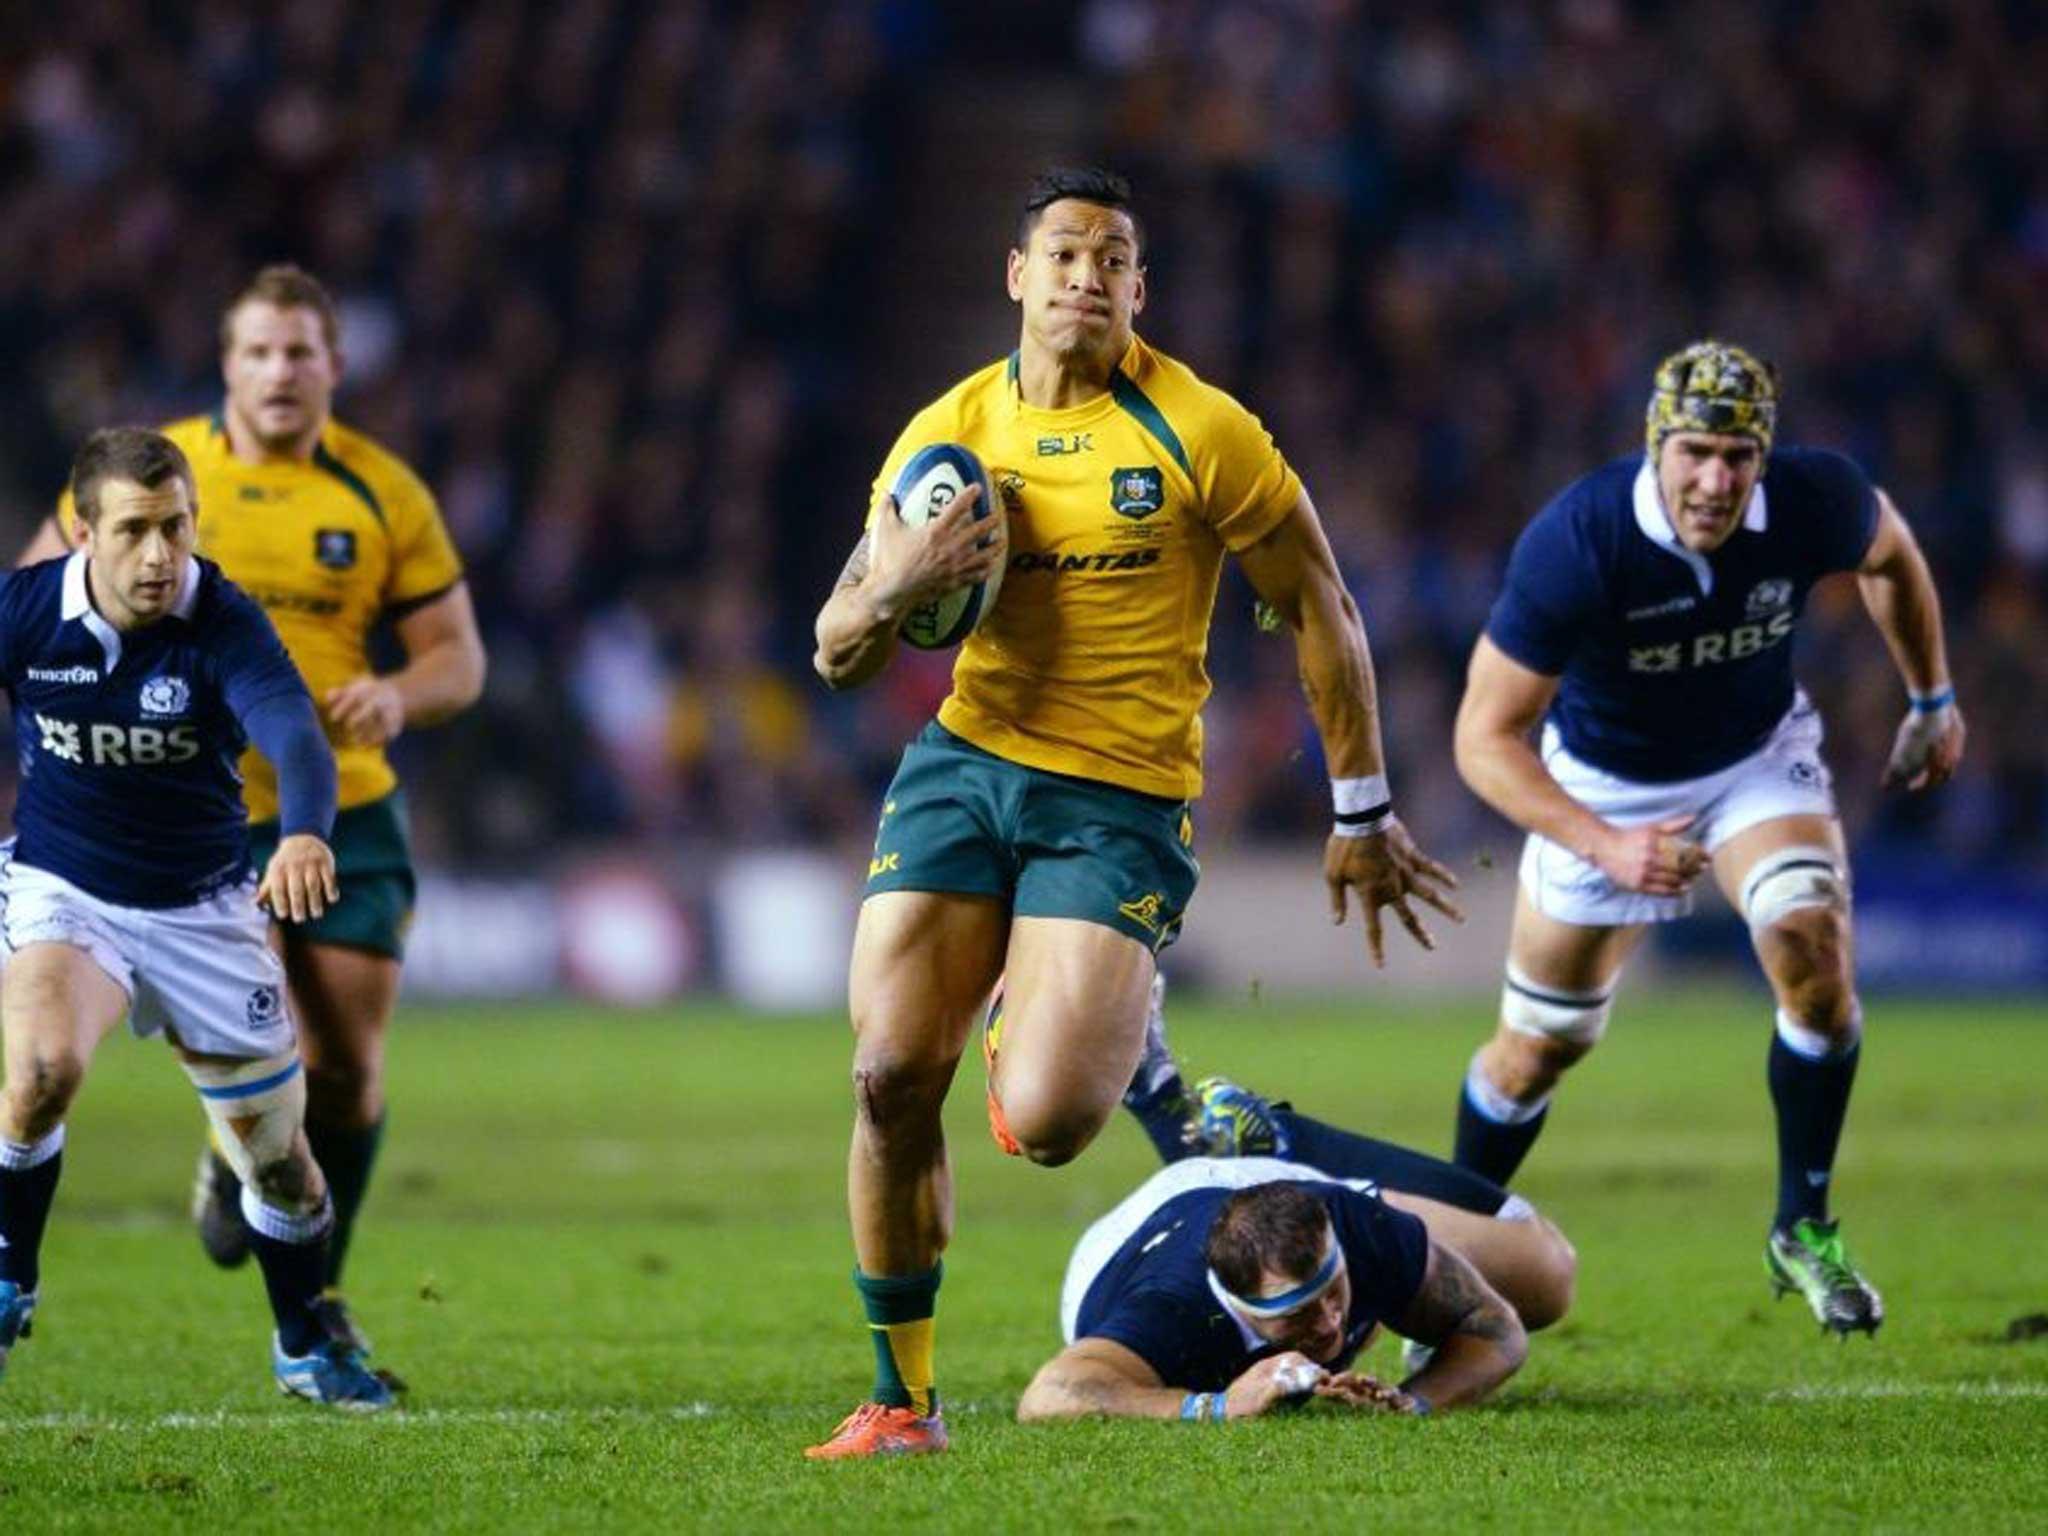 Scotland 15 Australia 21 Match Report Israel Folau Bursts Bubble